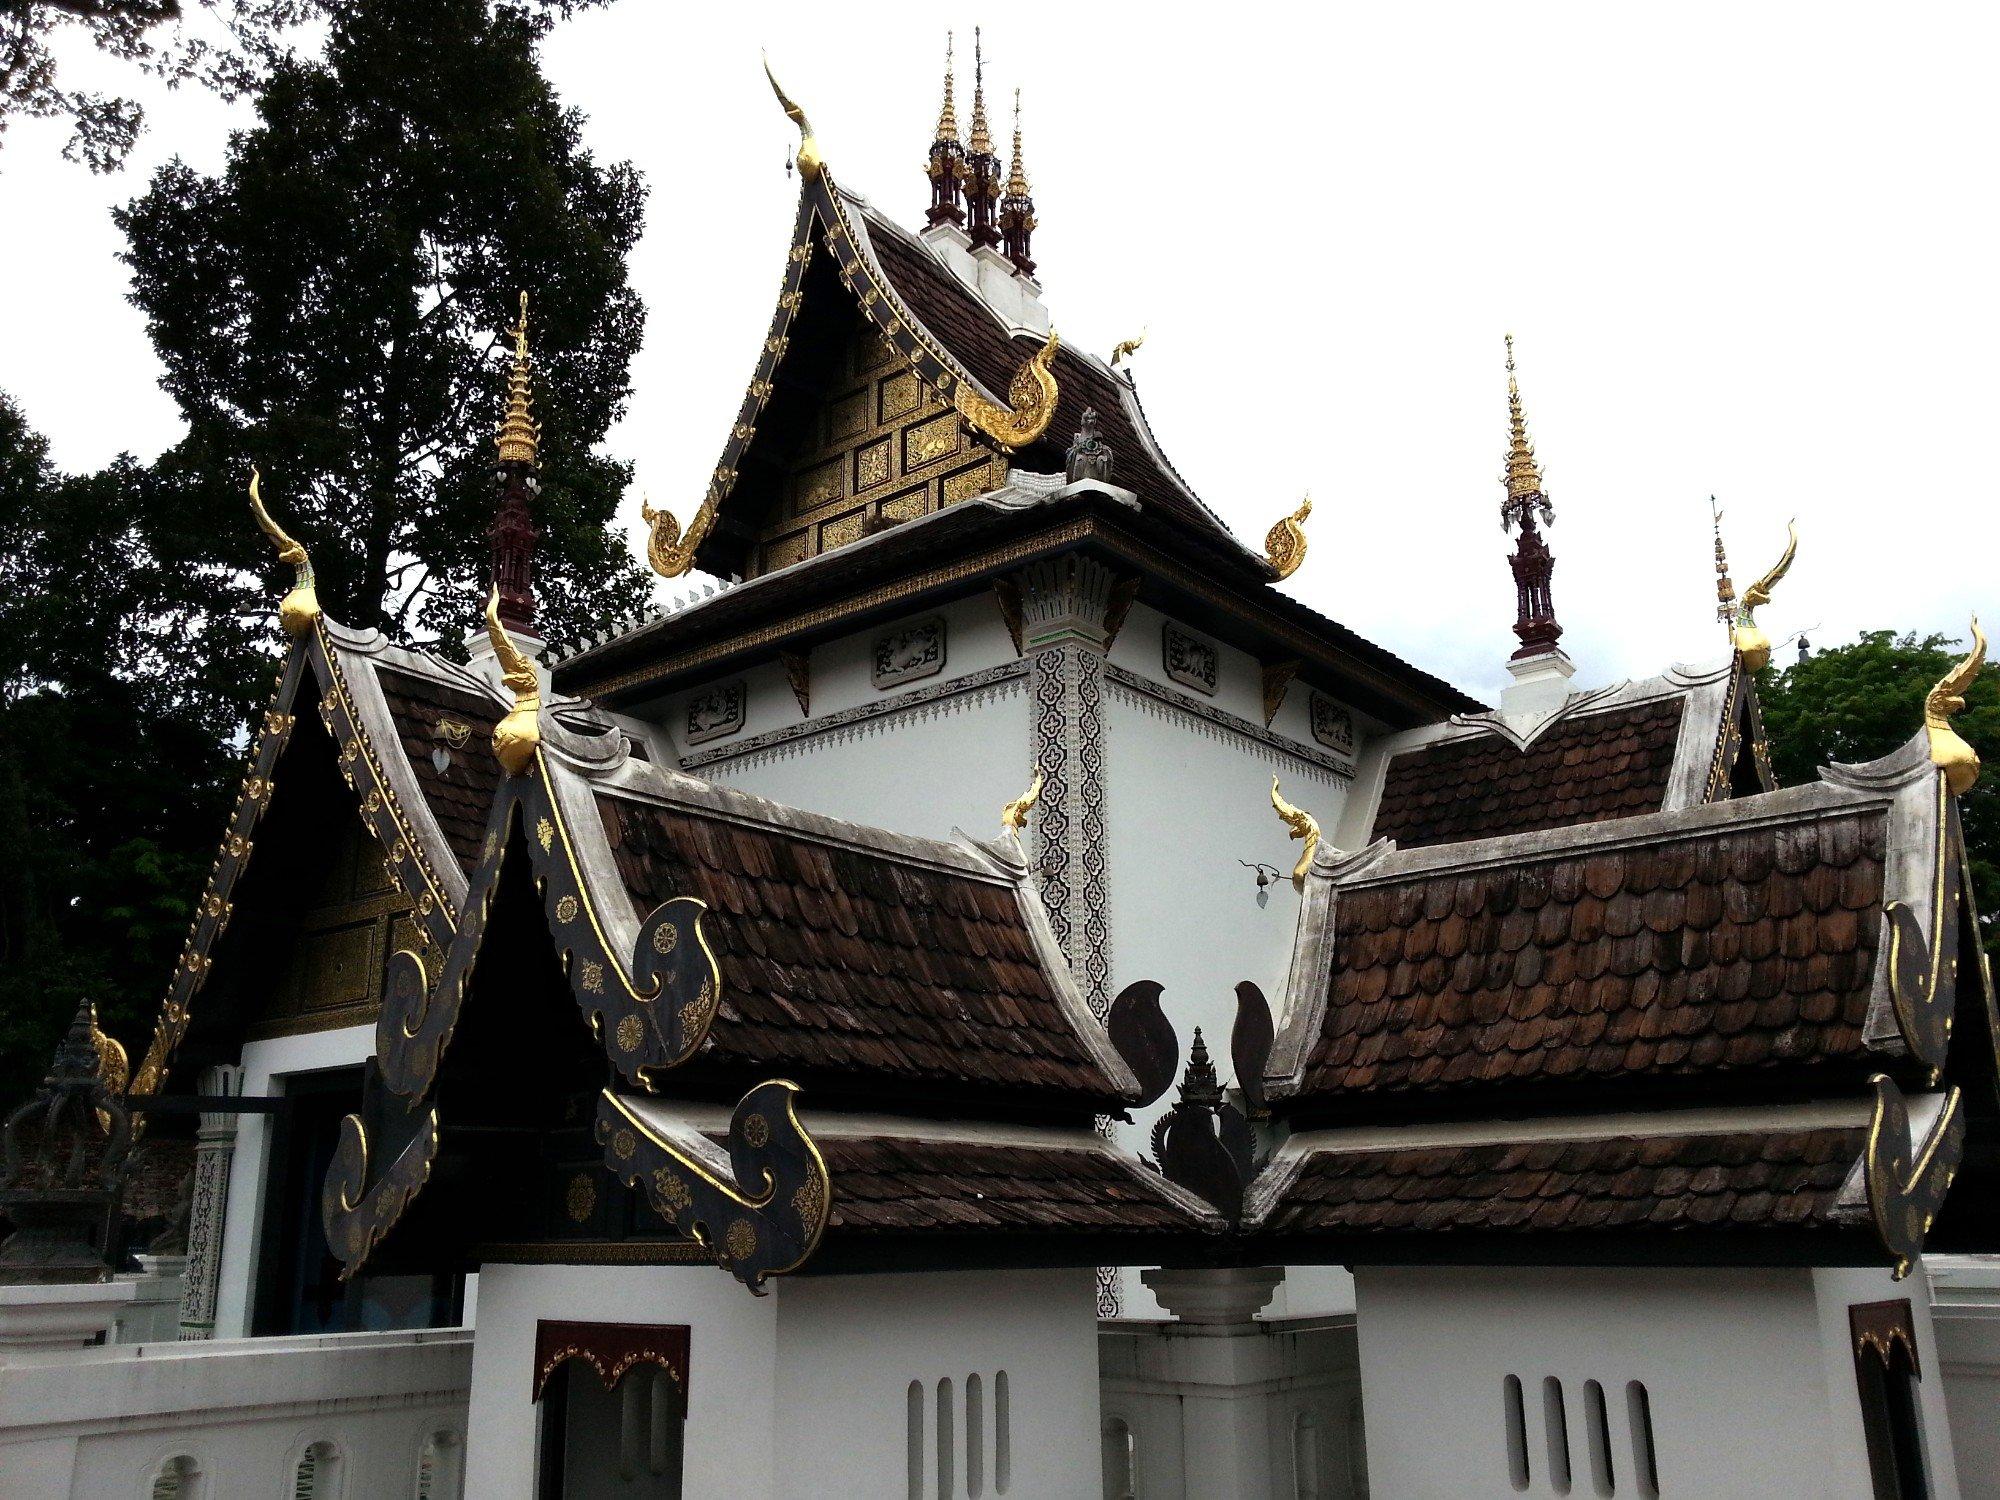 City Pillar Shrine at Wat Chedi Luang